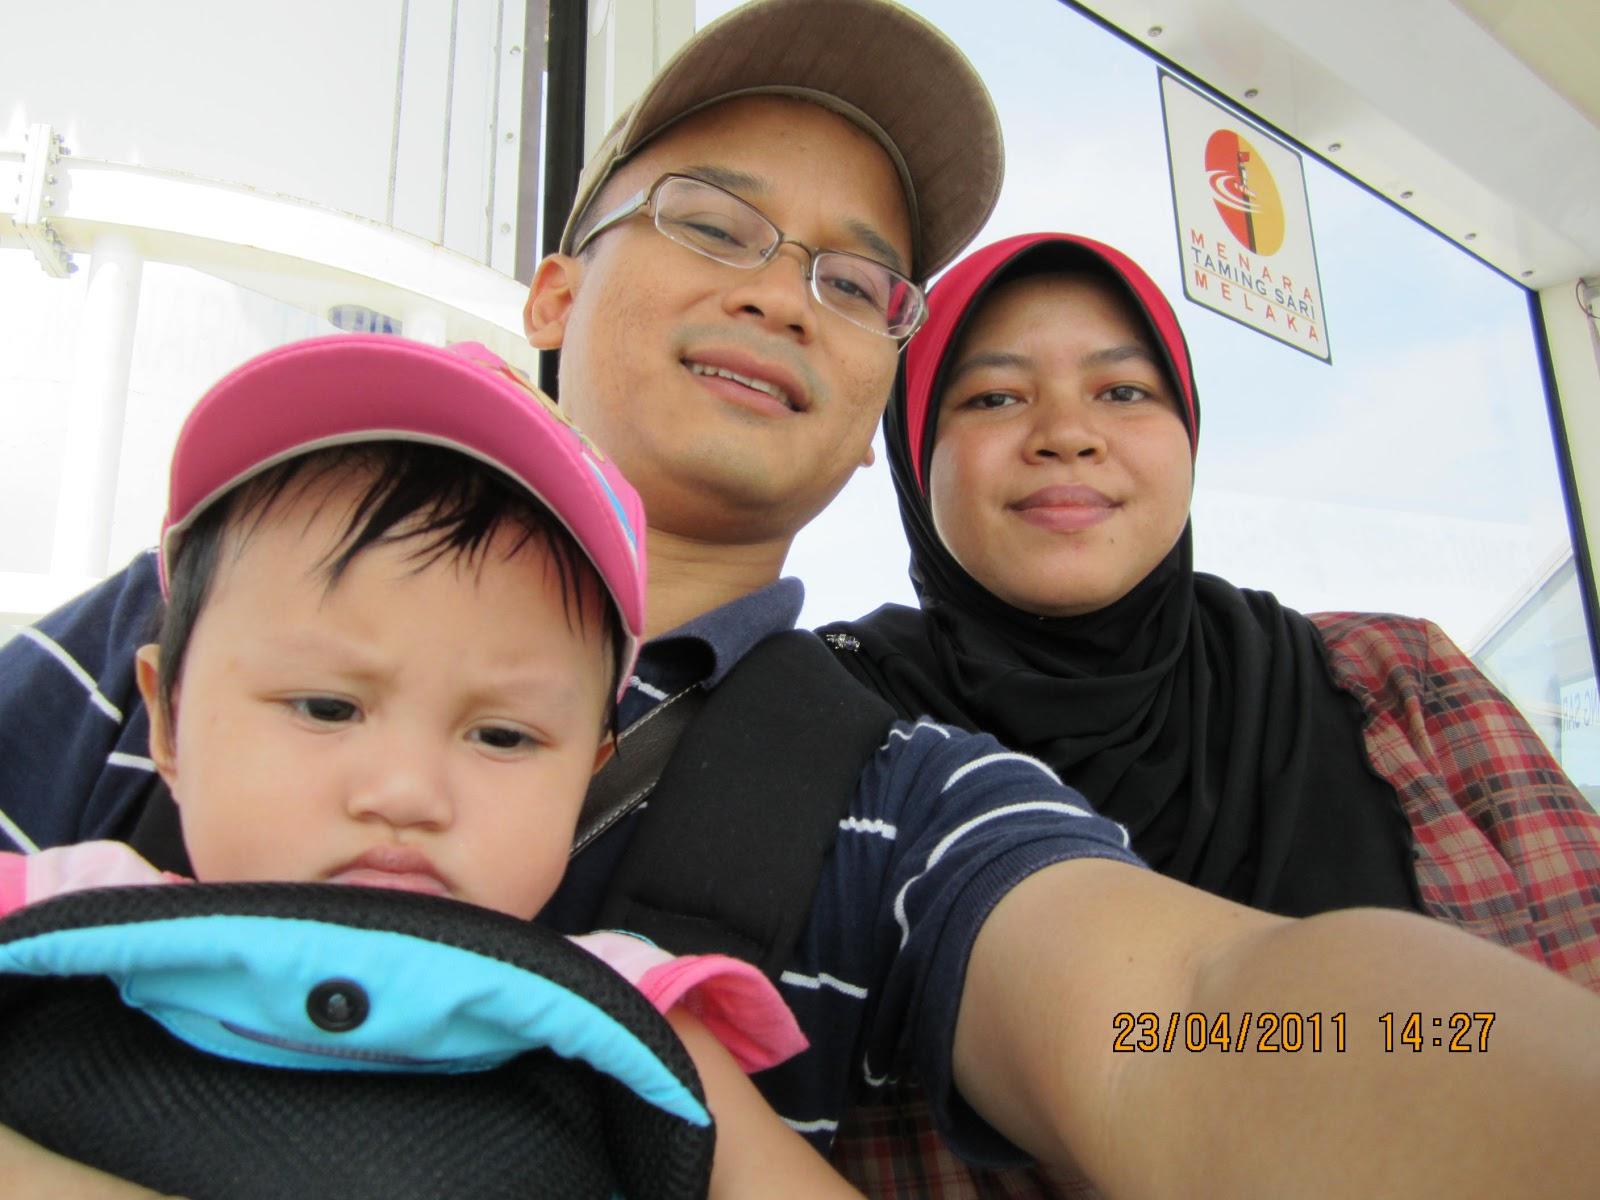 Gambar Burit Berair Submited Images Pic 2 Fly | Pelauts.Com